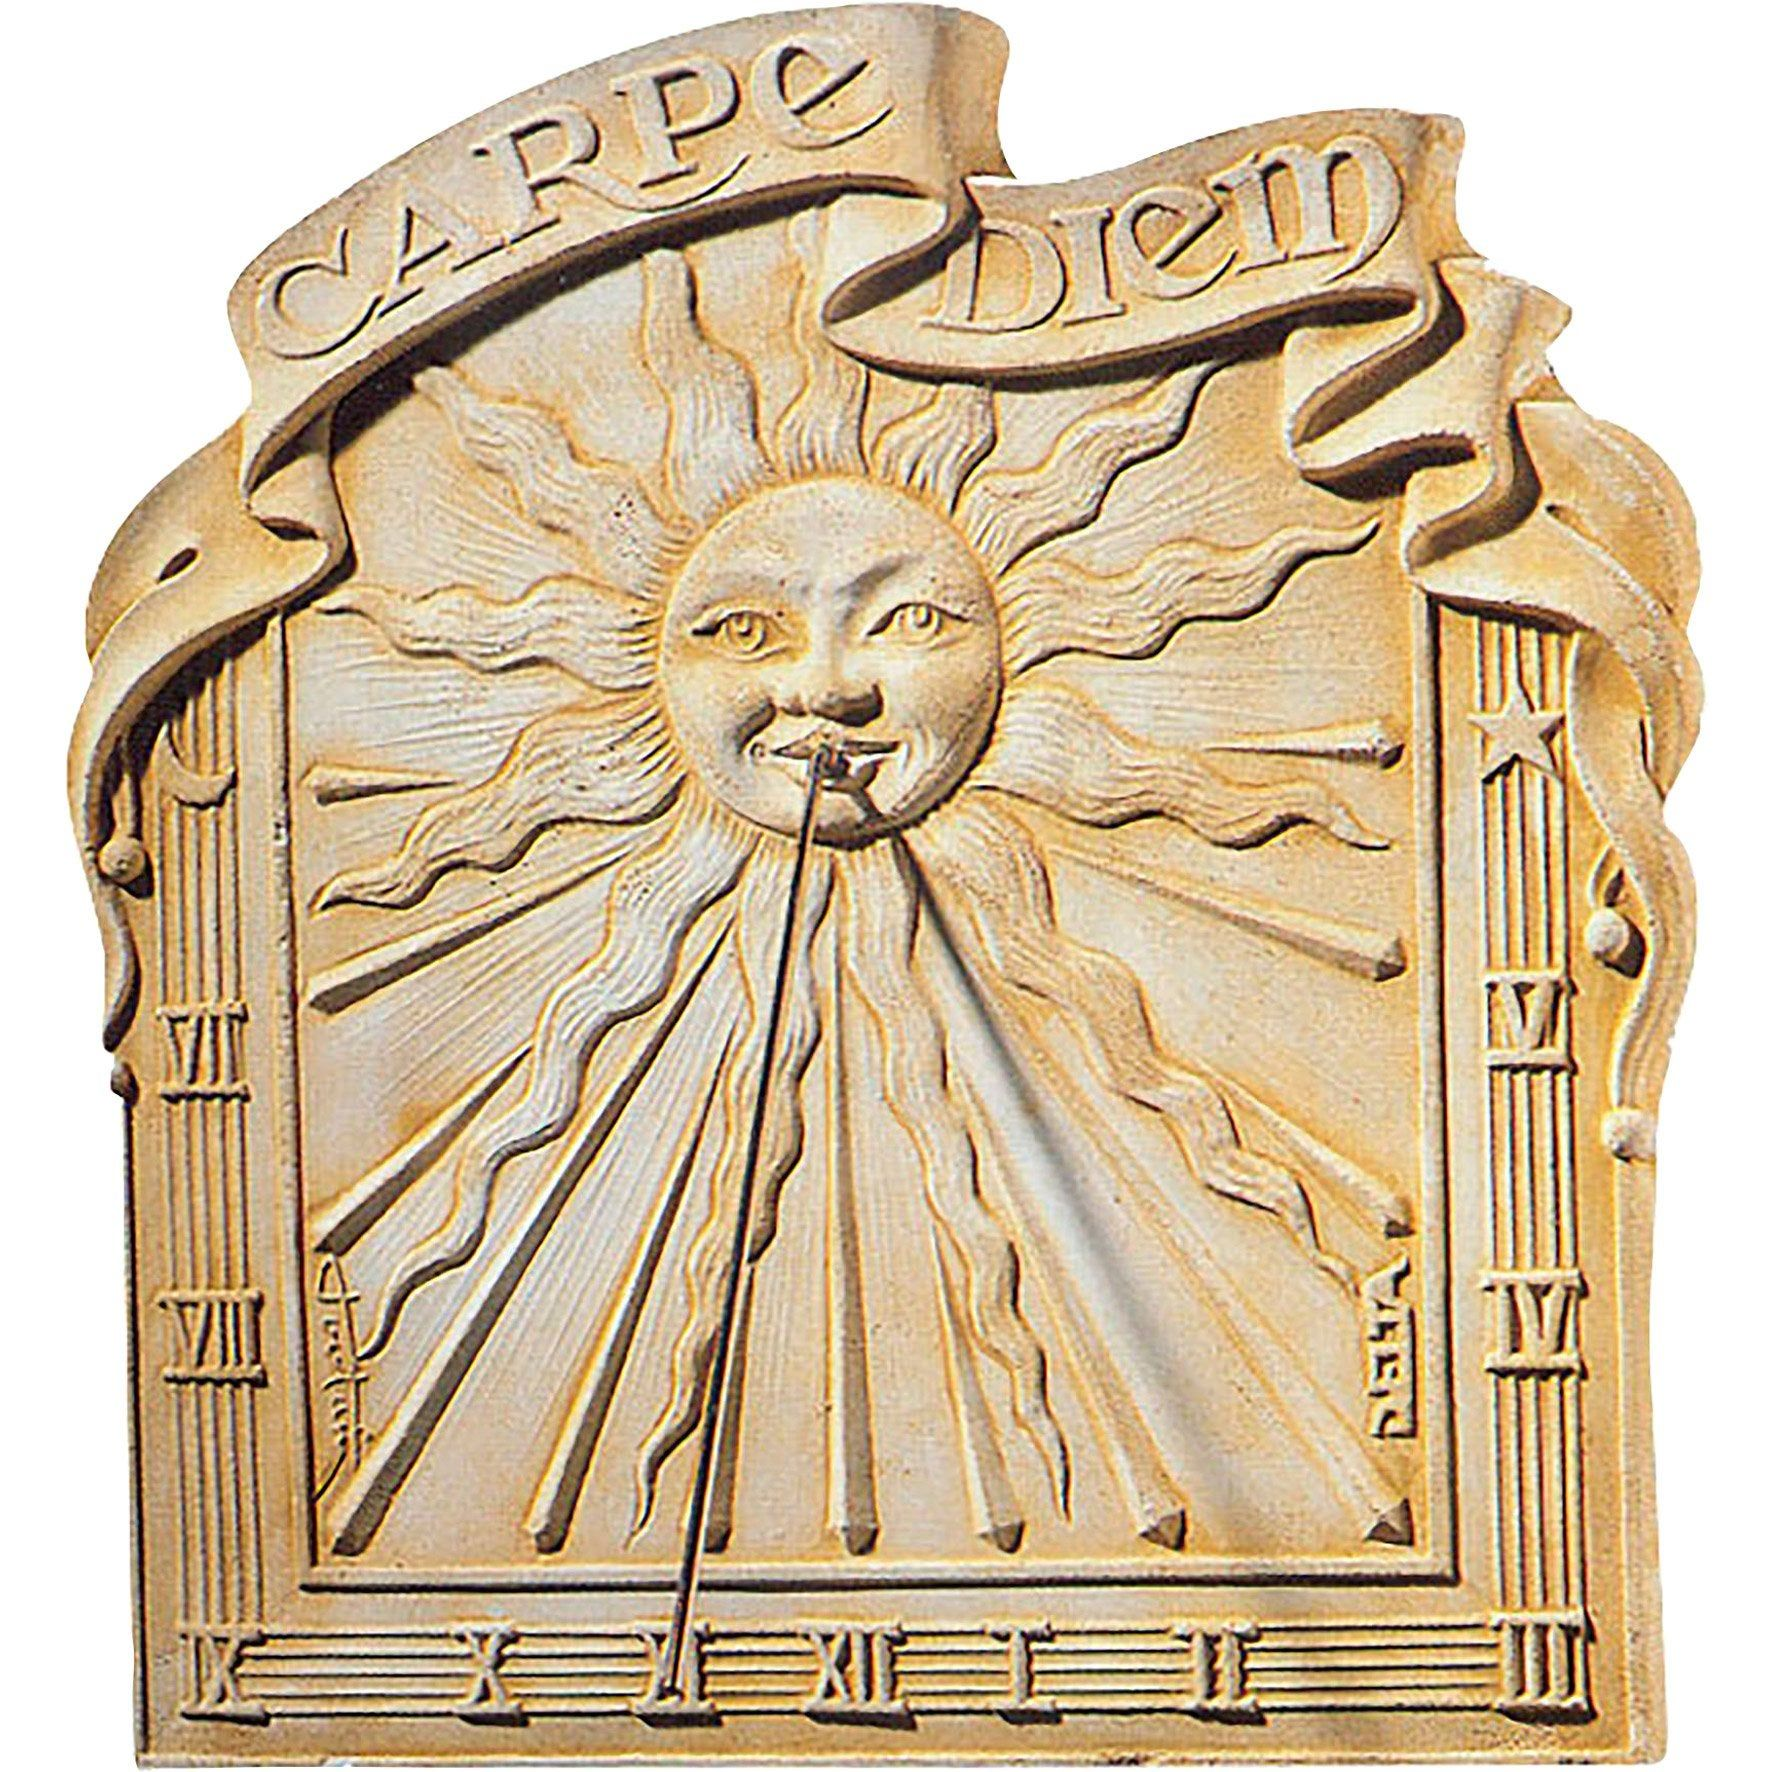 Figurine Decorative Cadran Solaire Delta Carpe Diem H60x59x5 Cm En